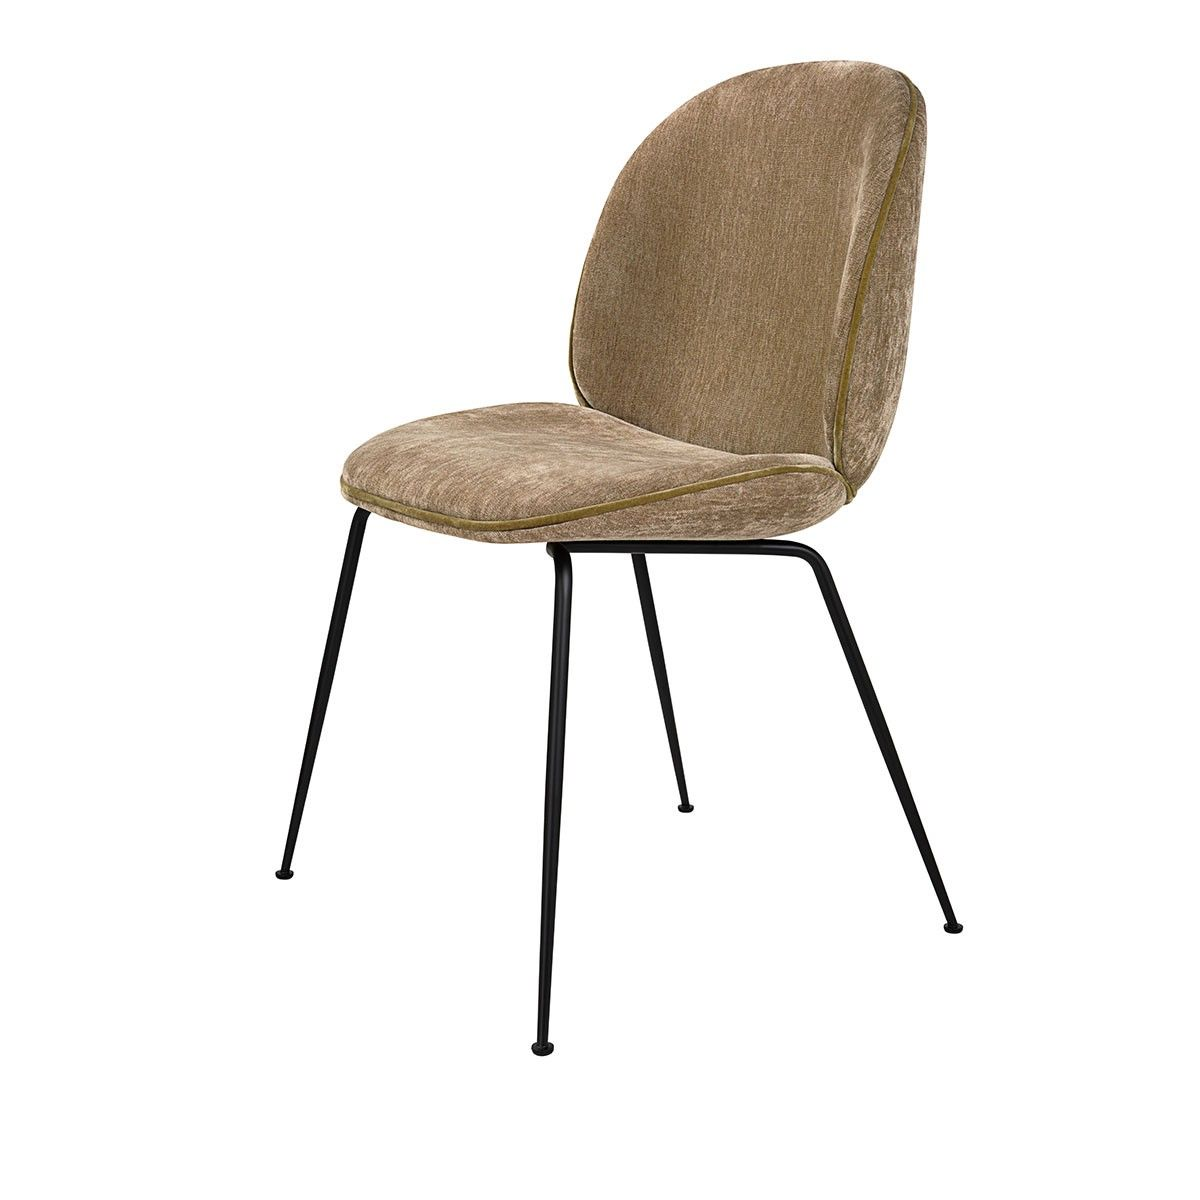 Chaise Beetle Velours Sable Pieds Noirs Gubi Dining Chairs Gubi Beetle Dining Chair Beetle Chair